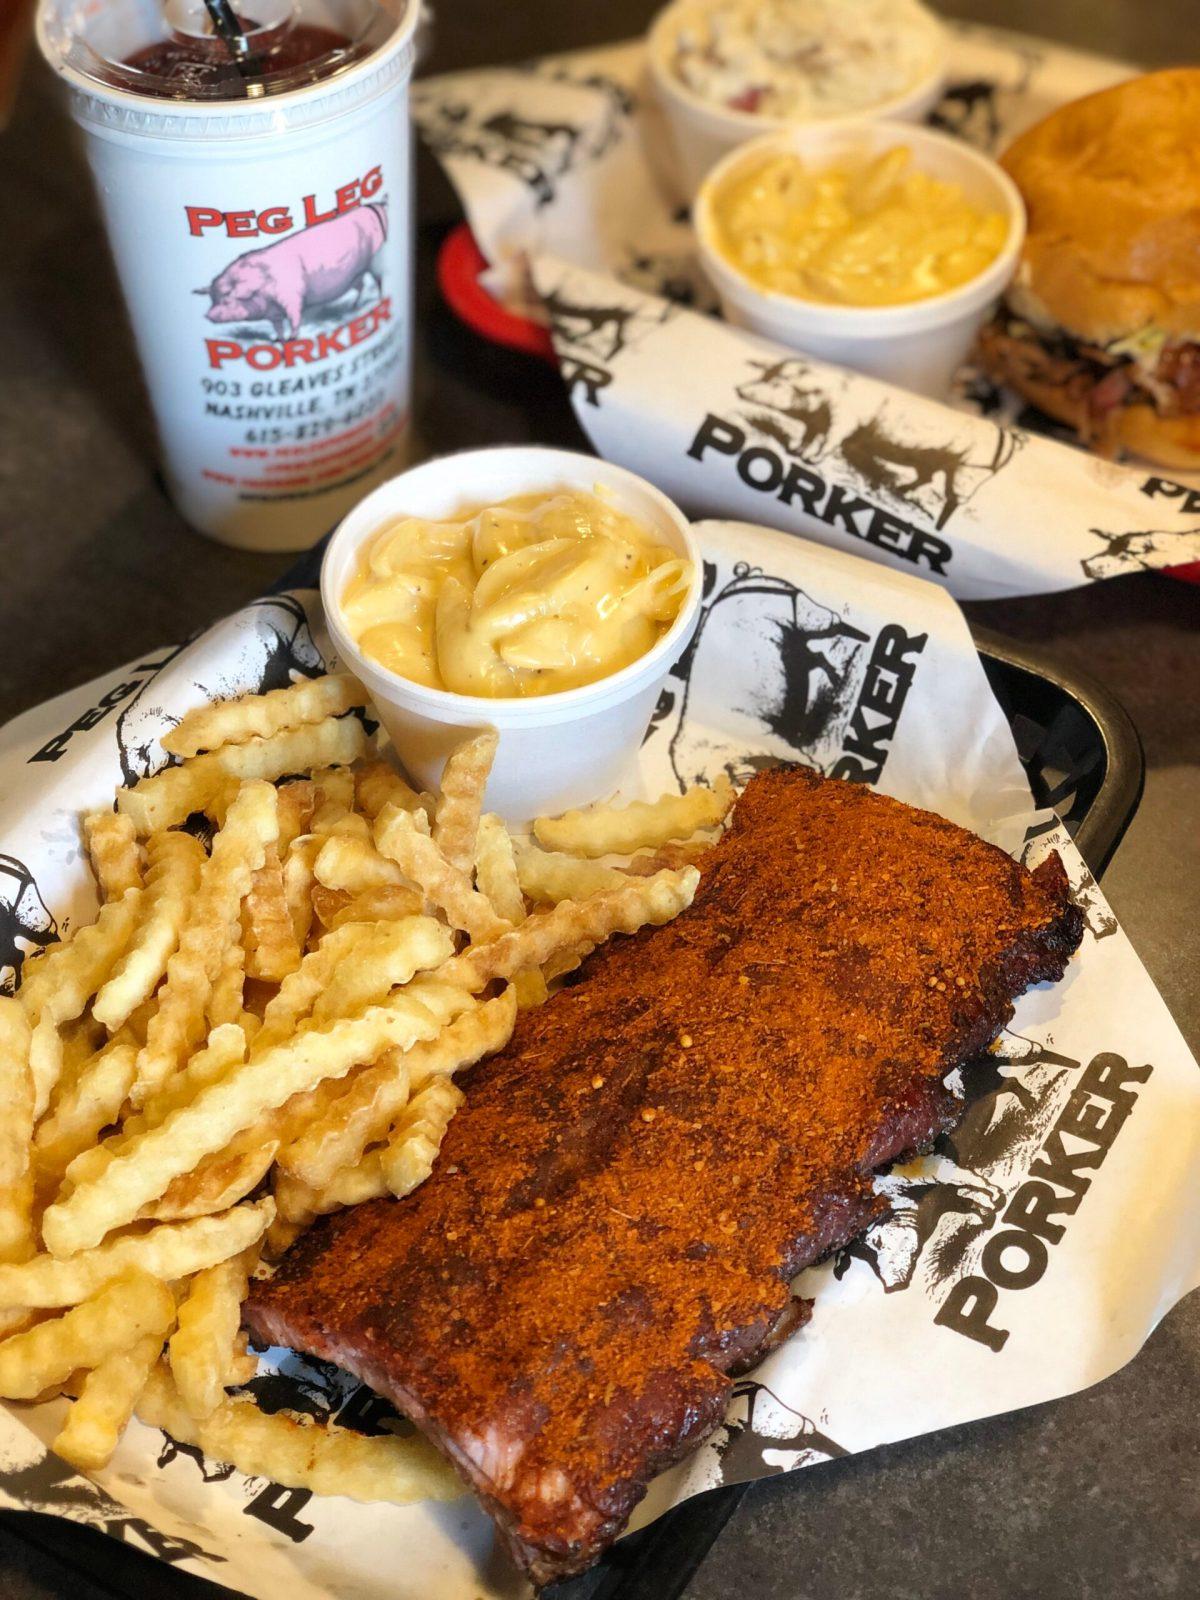 BBQ Ribs at Peg Leg Porker | Nashville, TN #peglegporker #nashvillebbq #whattoeatinnasville #wheretoeatinnashville #bestbbqnashville #bbqrestaurantsnashville #nashvilleinstagram